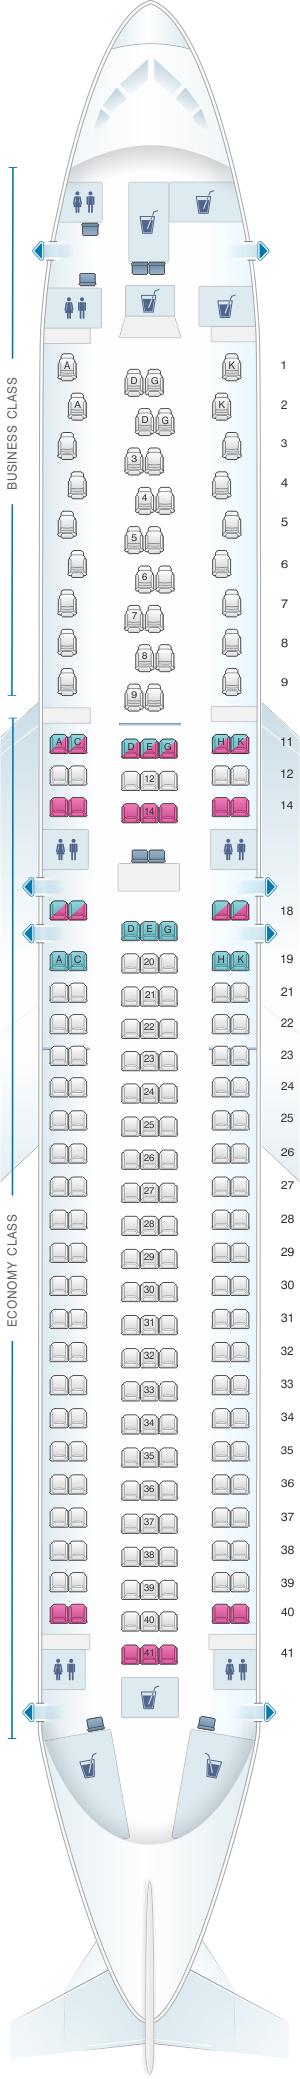 Seat map for Austrian Airlines Boeing B767 300 ER V1